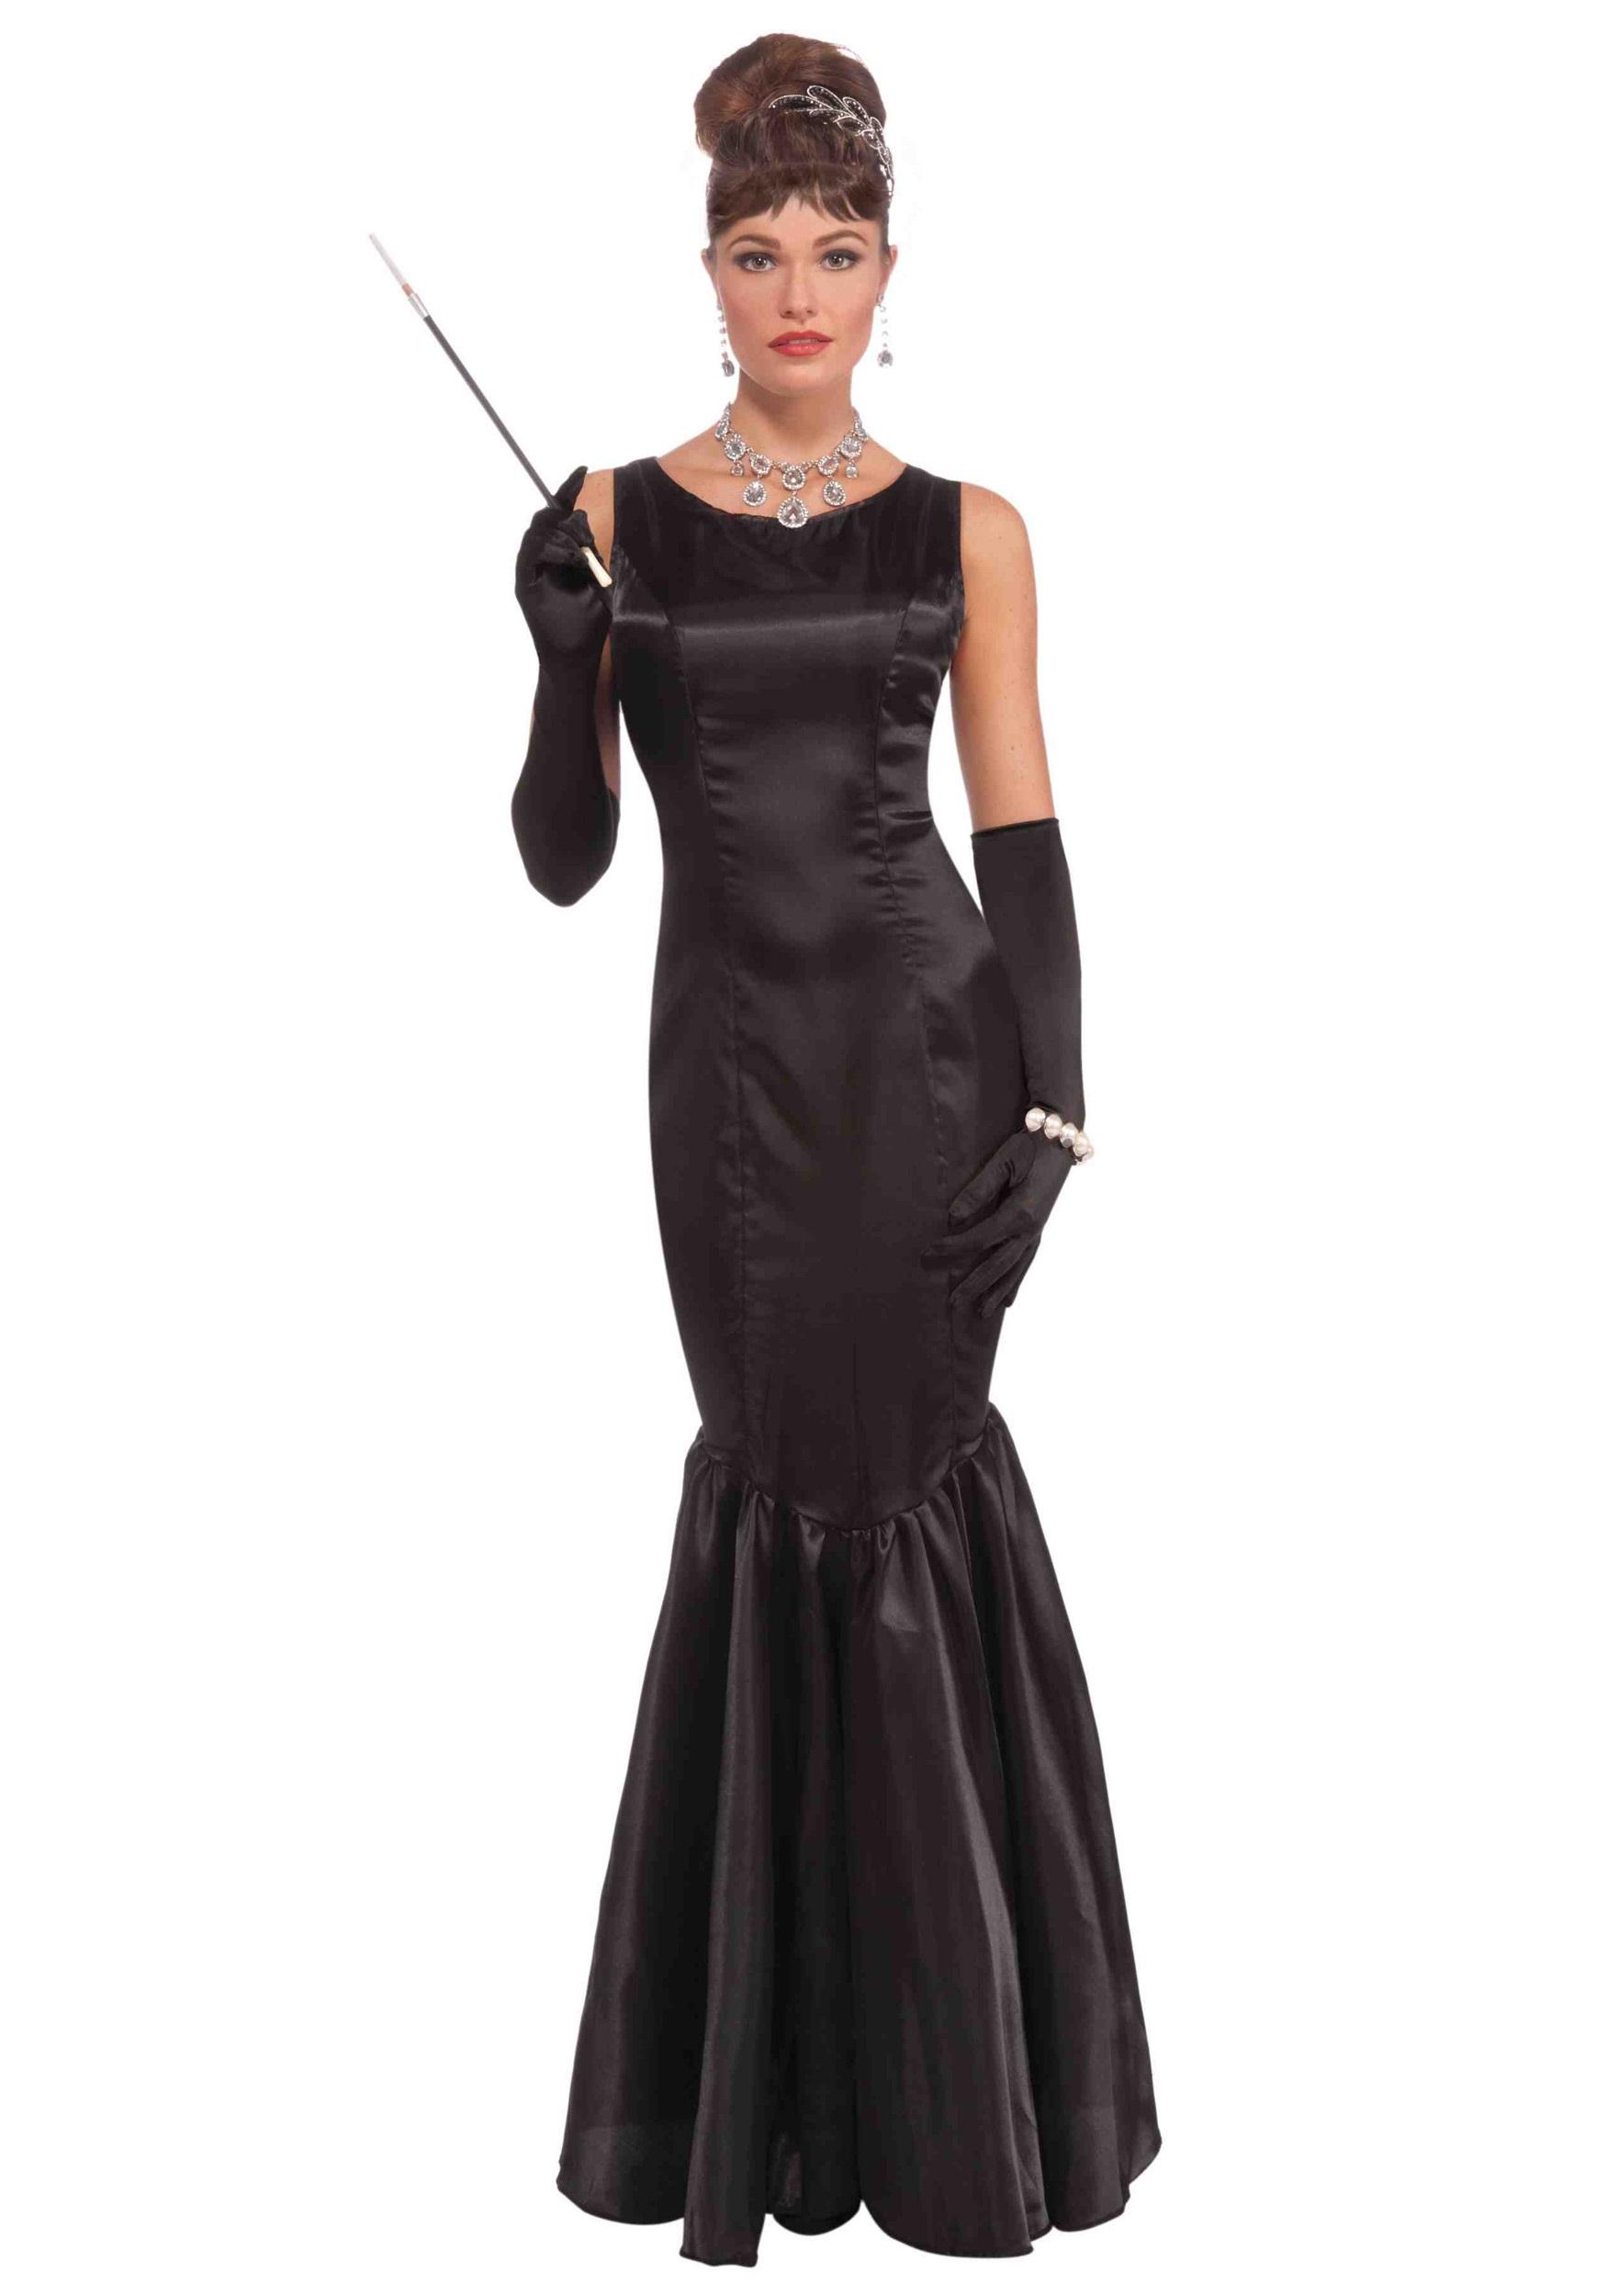 Women's High Society Costume Dress